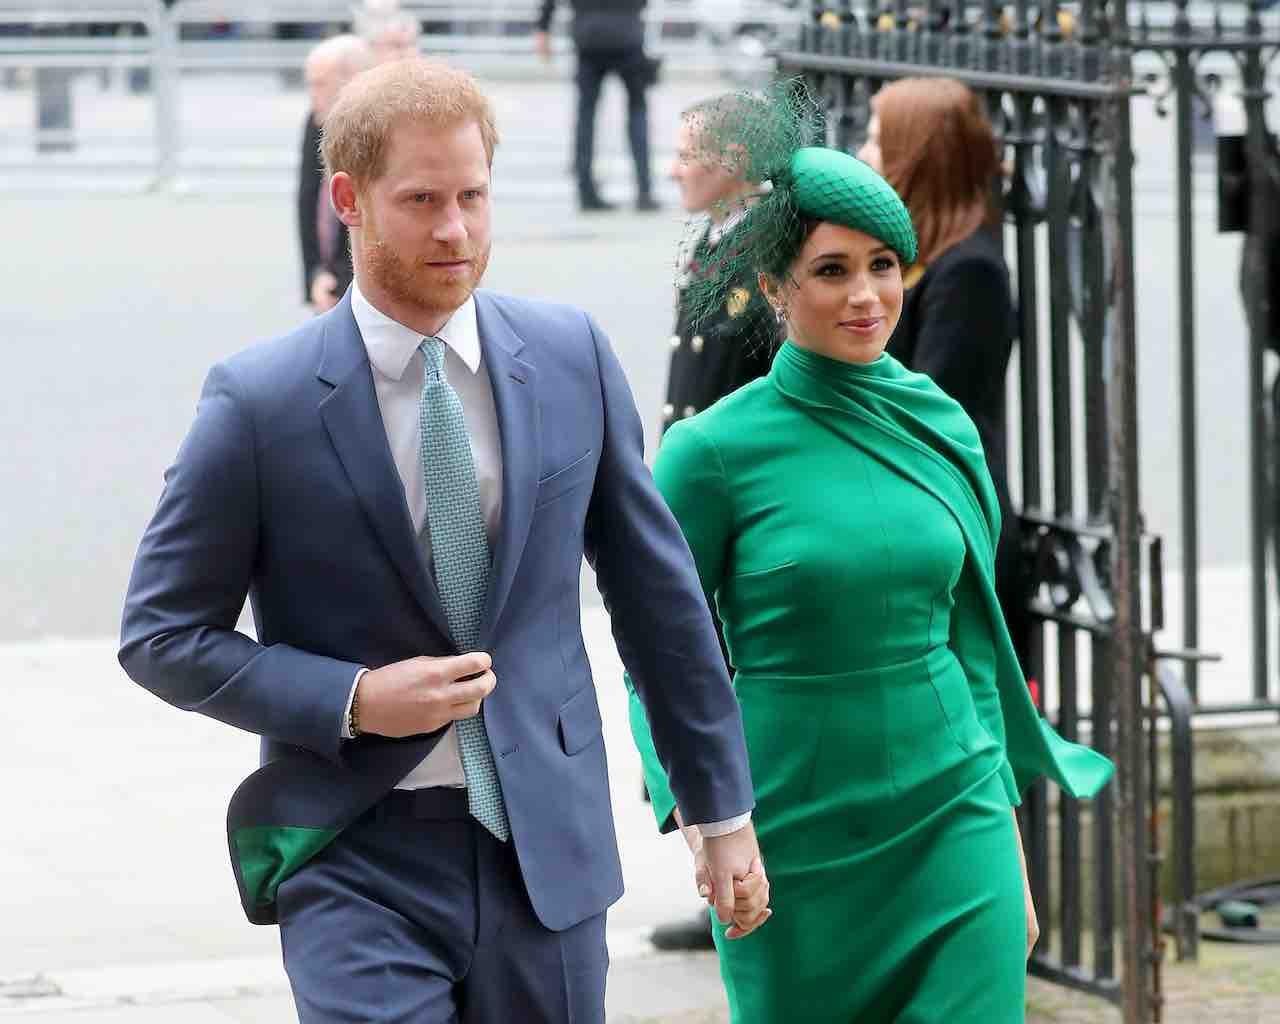 Harry compie 36 anni lontano dalla Royal Family (Getty Images)